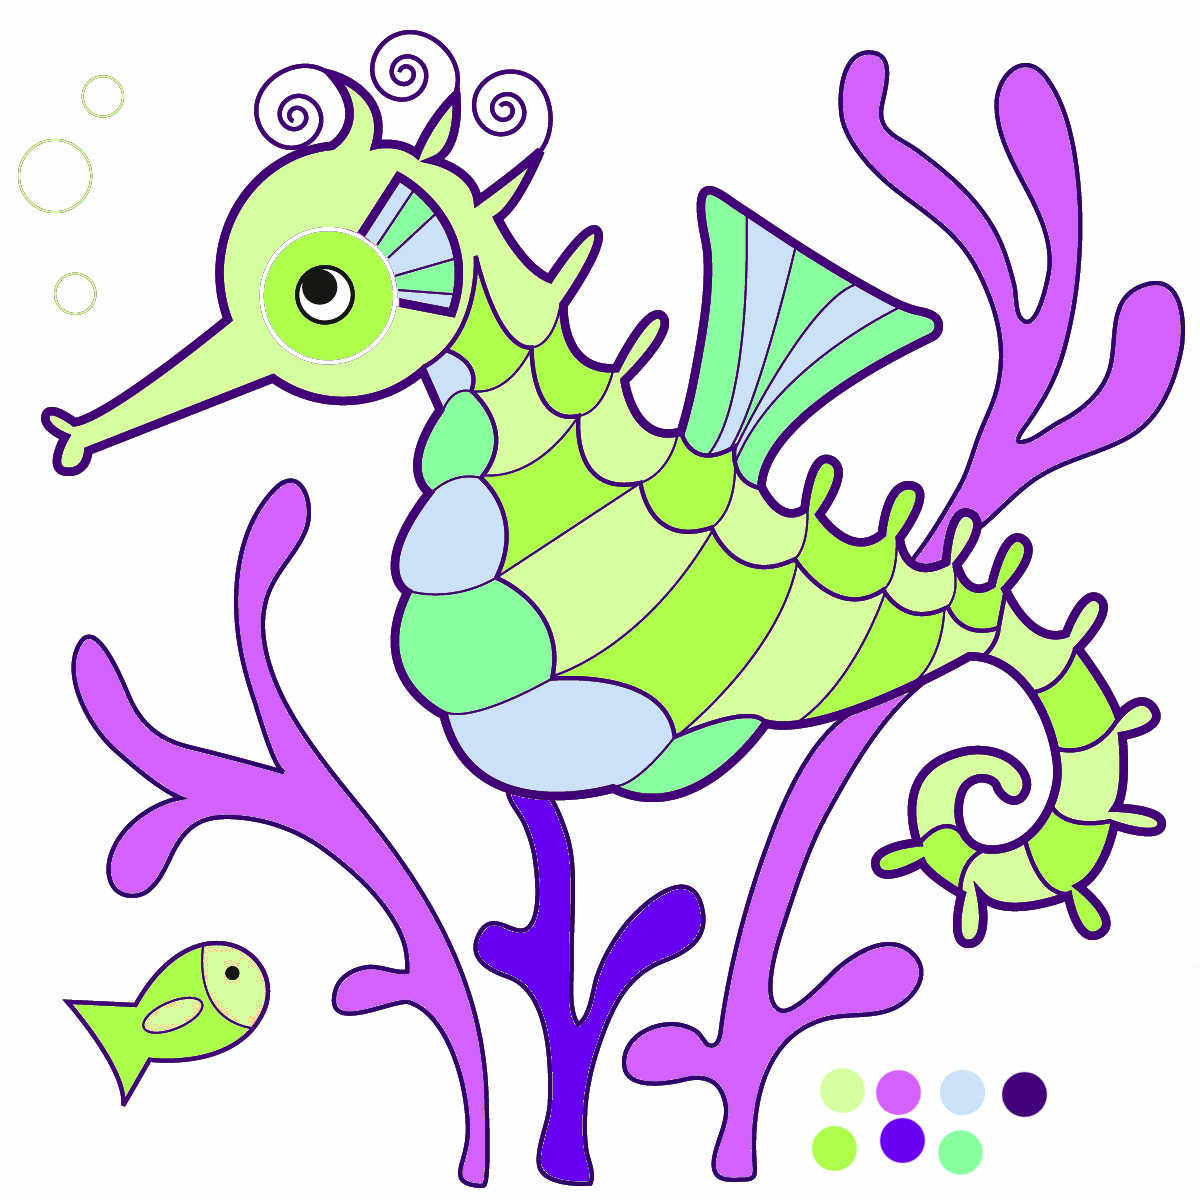 Seahorse Clip Art Images Free Clipart-Seahorse clip art images free clipart-5